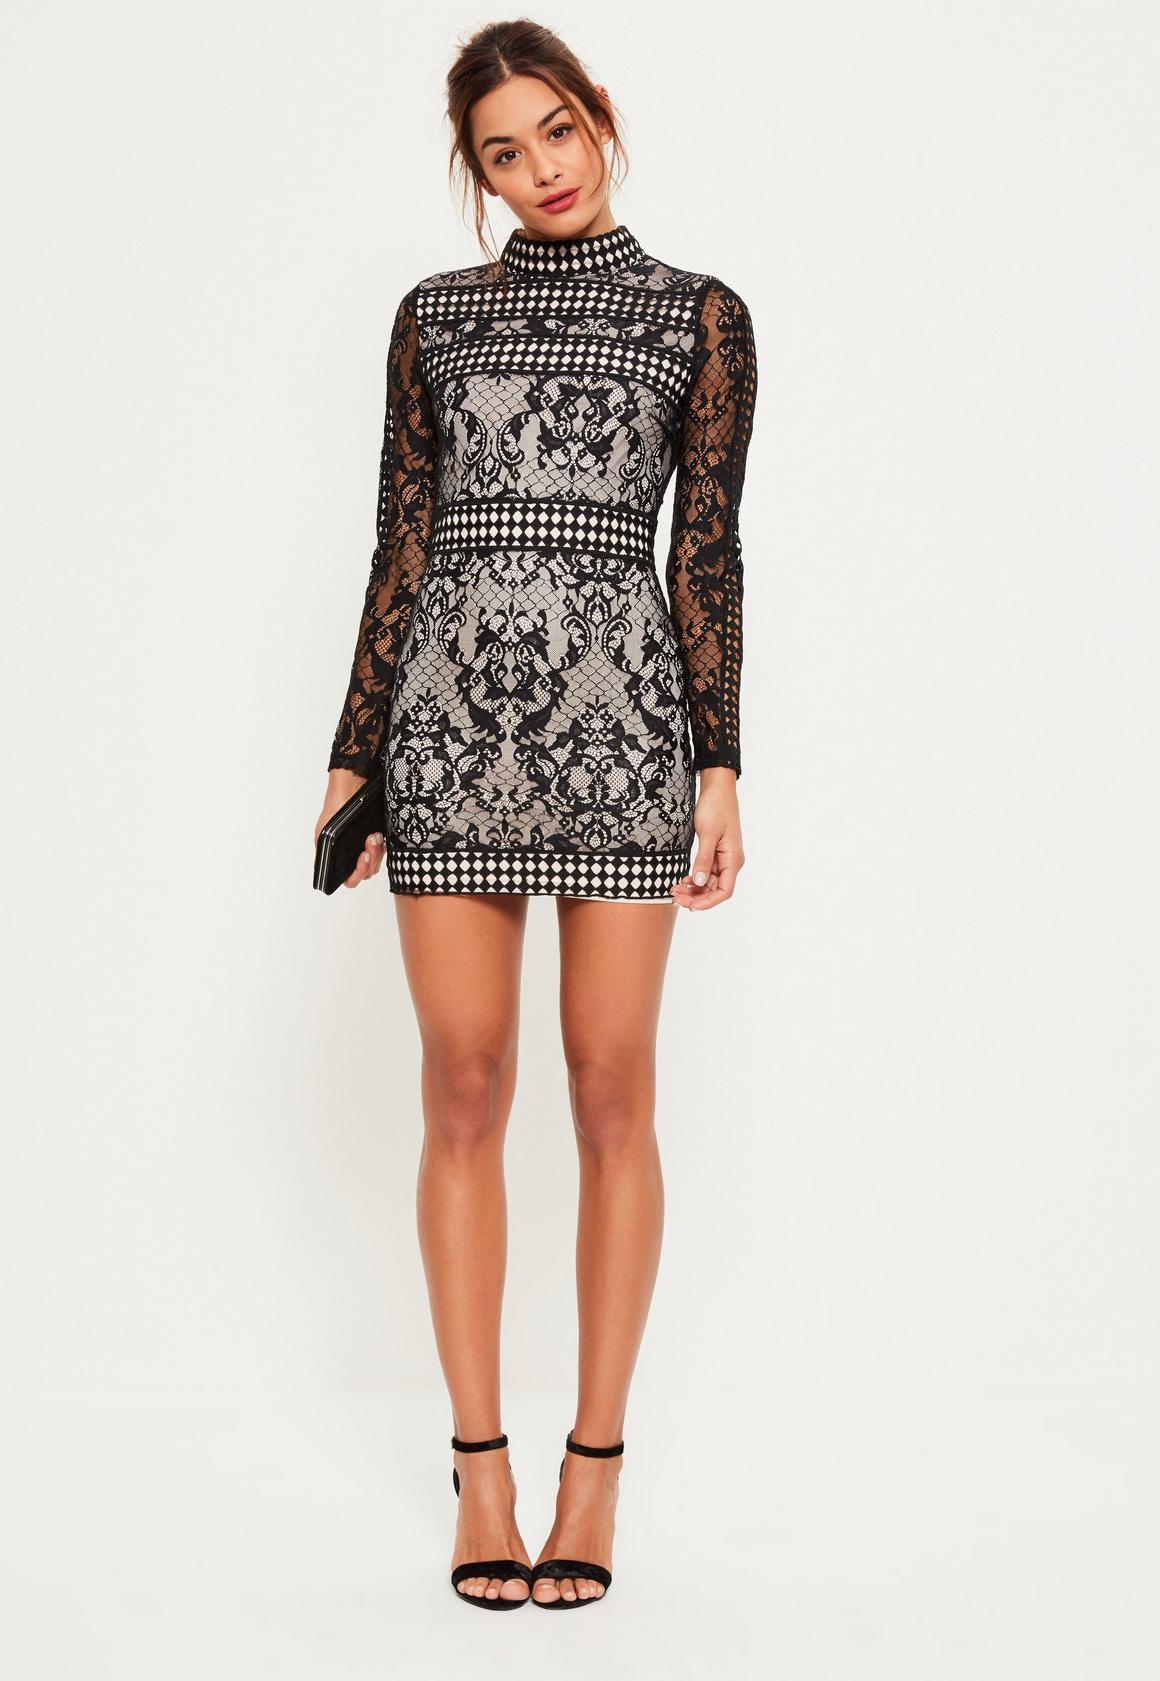 Hochgeschlossenes figurbetontes Kleid mit Spitzen-Overlay in Schwarz ...